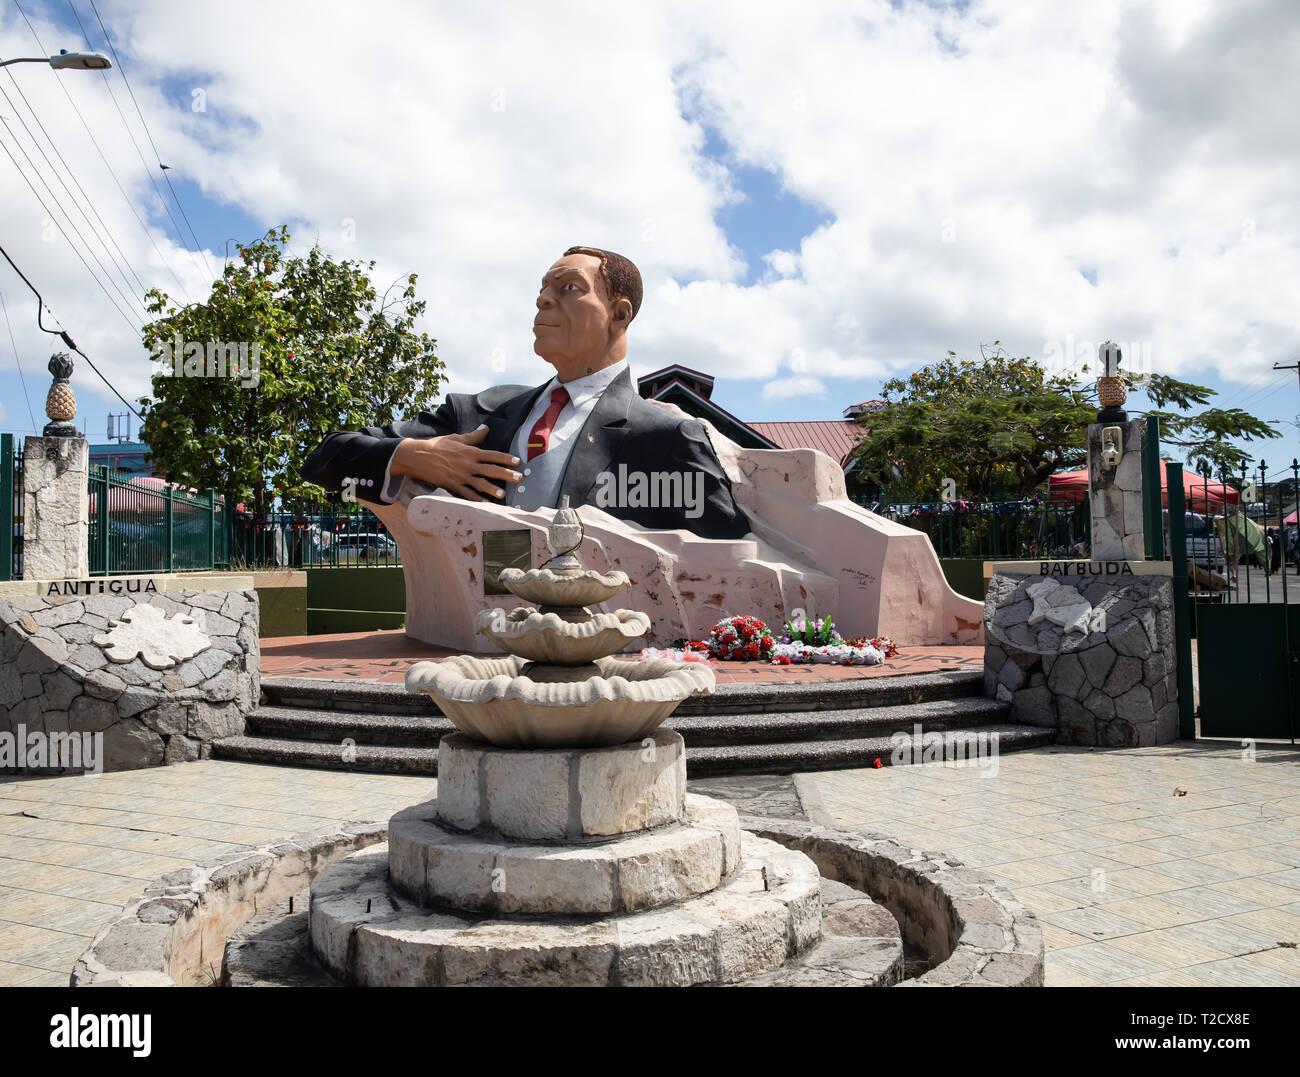 in Saint John's, Capital of Antigua and Barbuda Stock Photo